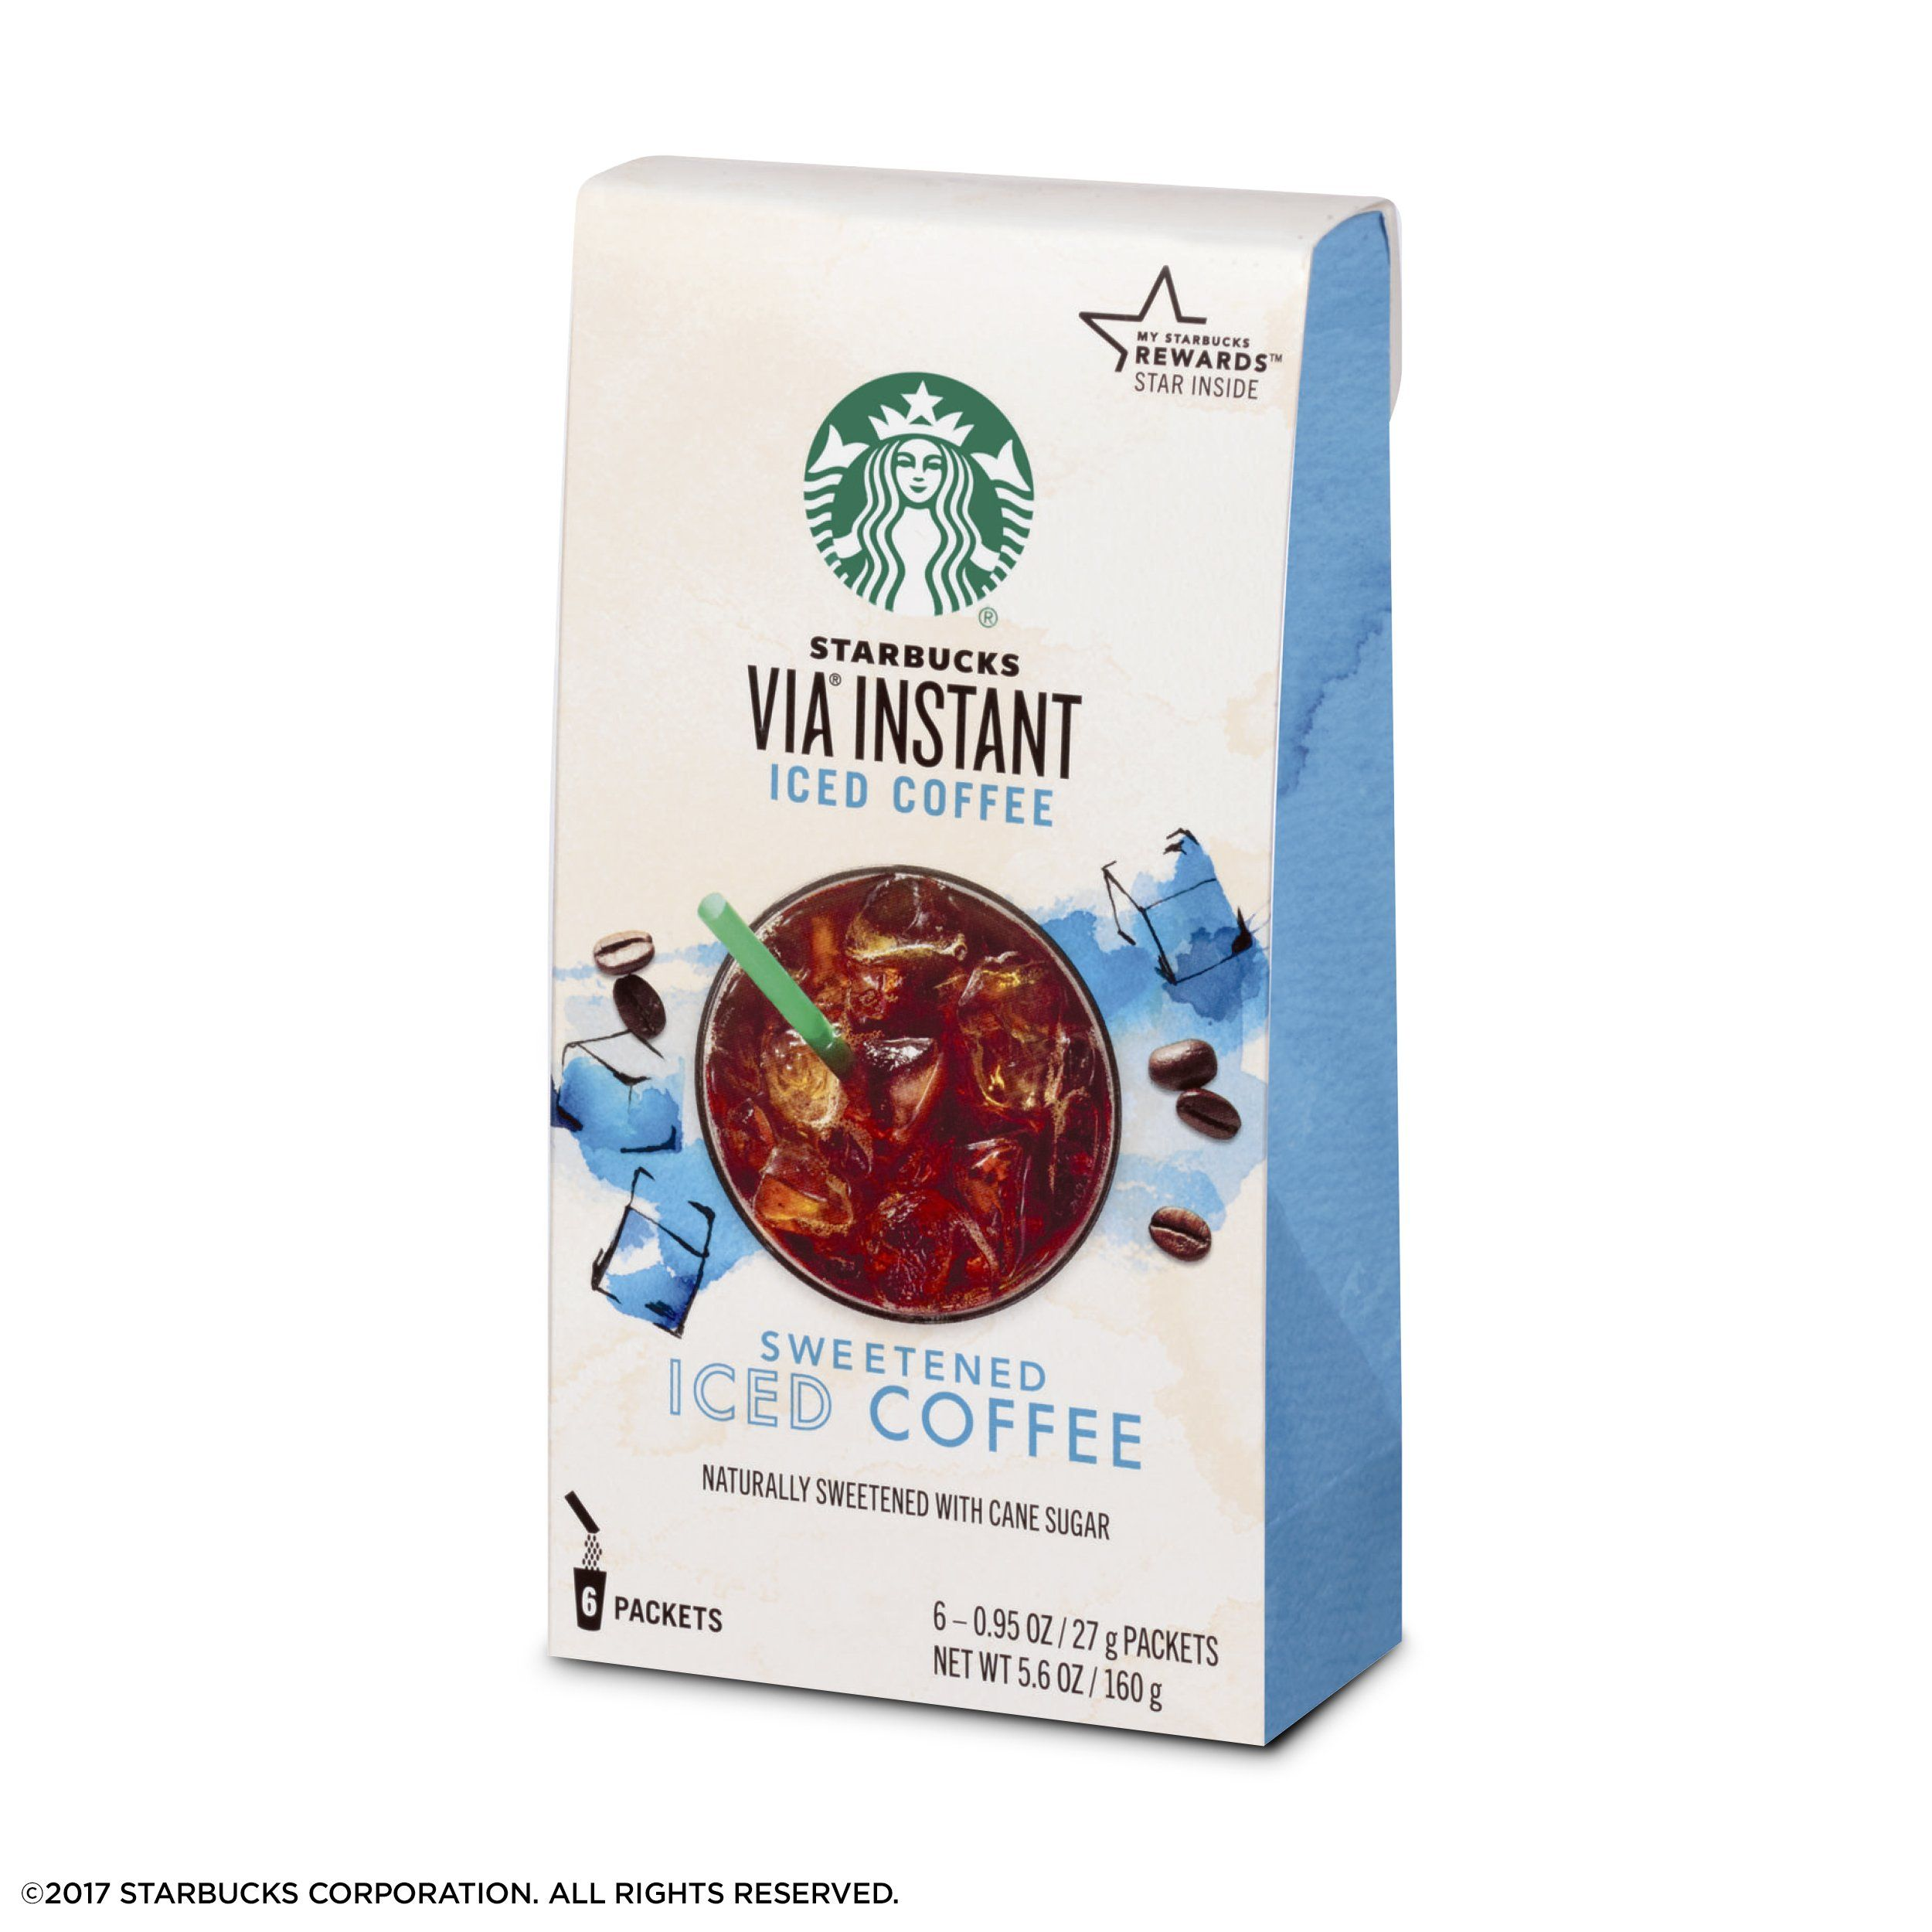 Starbucks Via Instant Sweetened Iced Coffee 1 Box Of 6